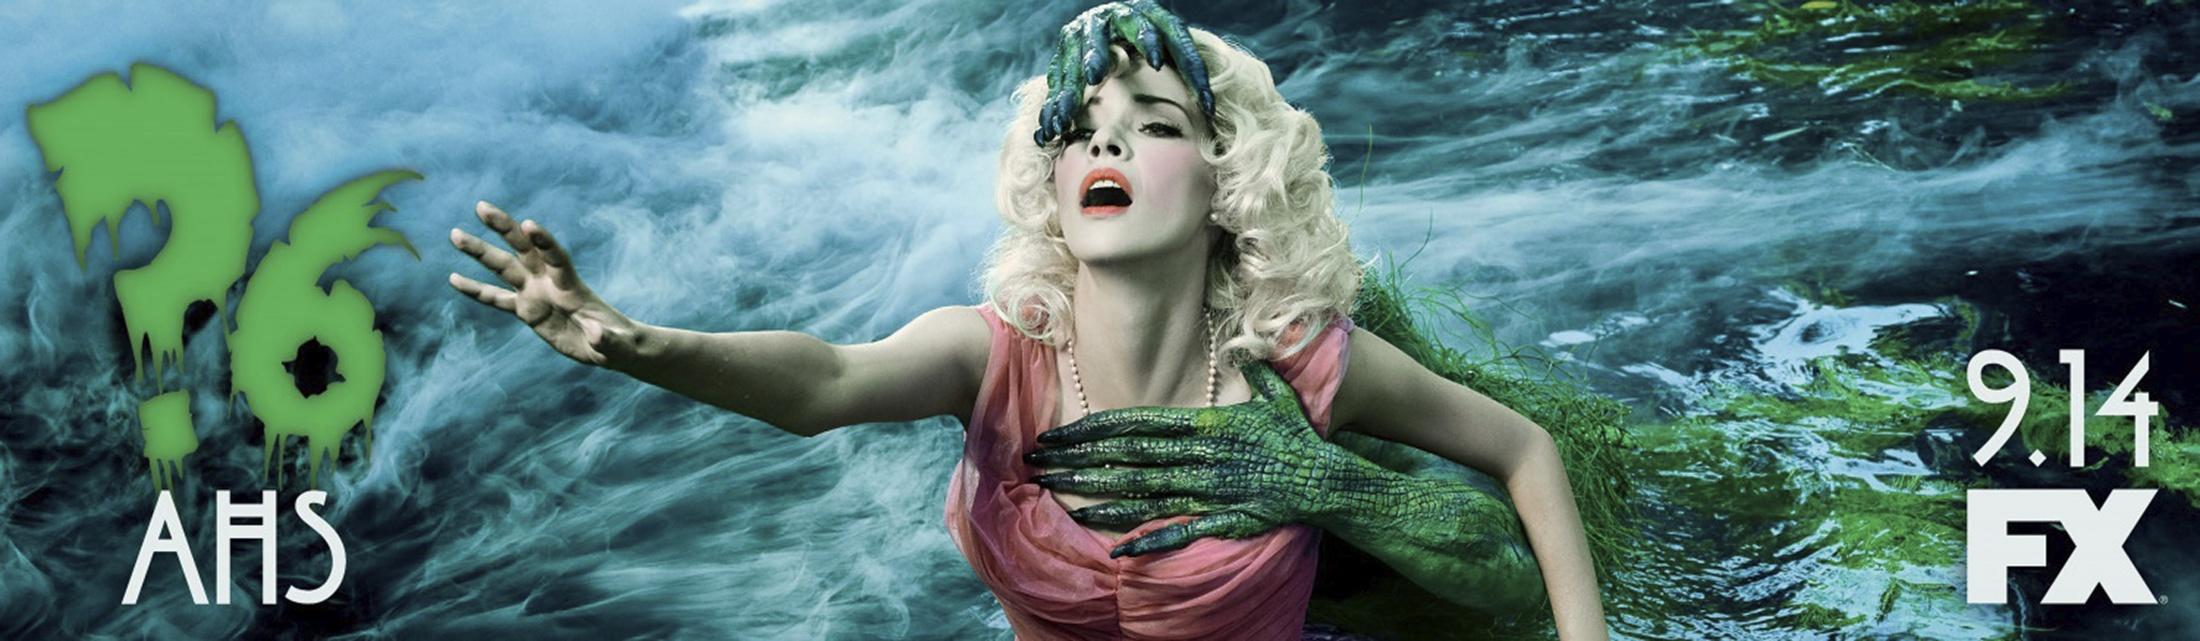 Thumbnail for American Horror Story - Roanoke teaser billboard (lagoon creature)